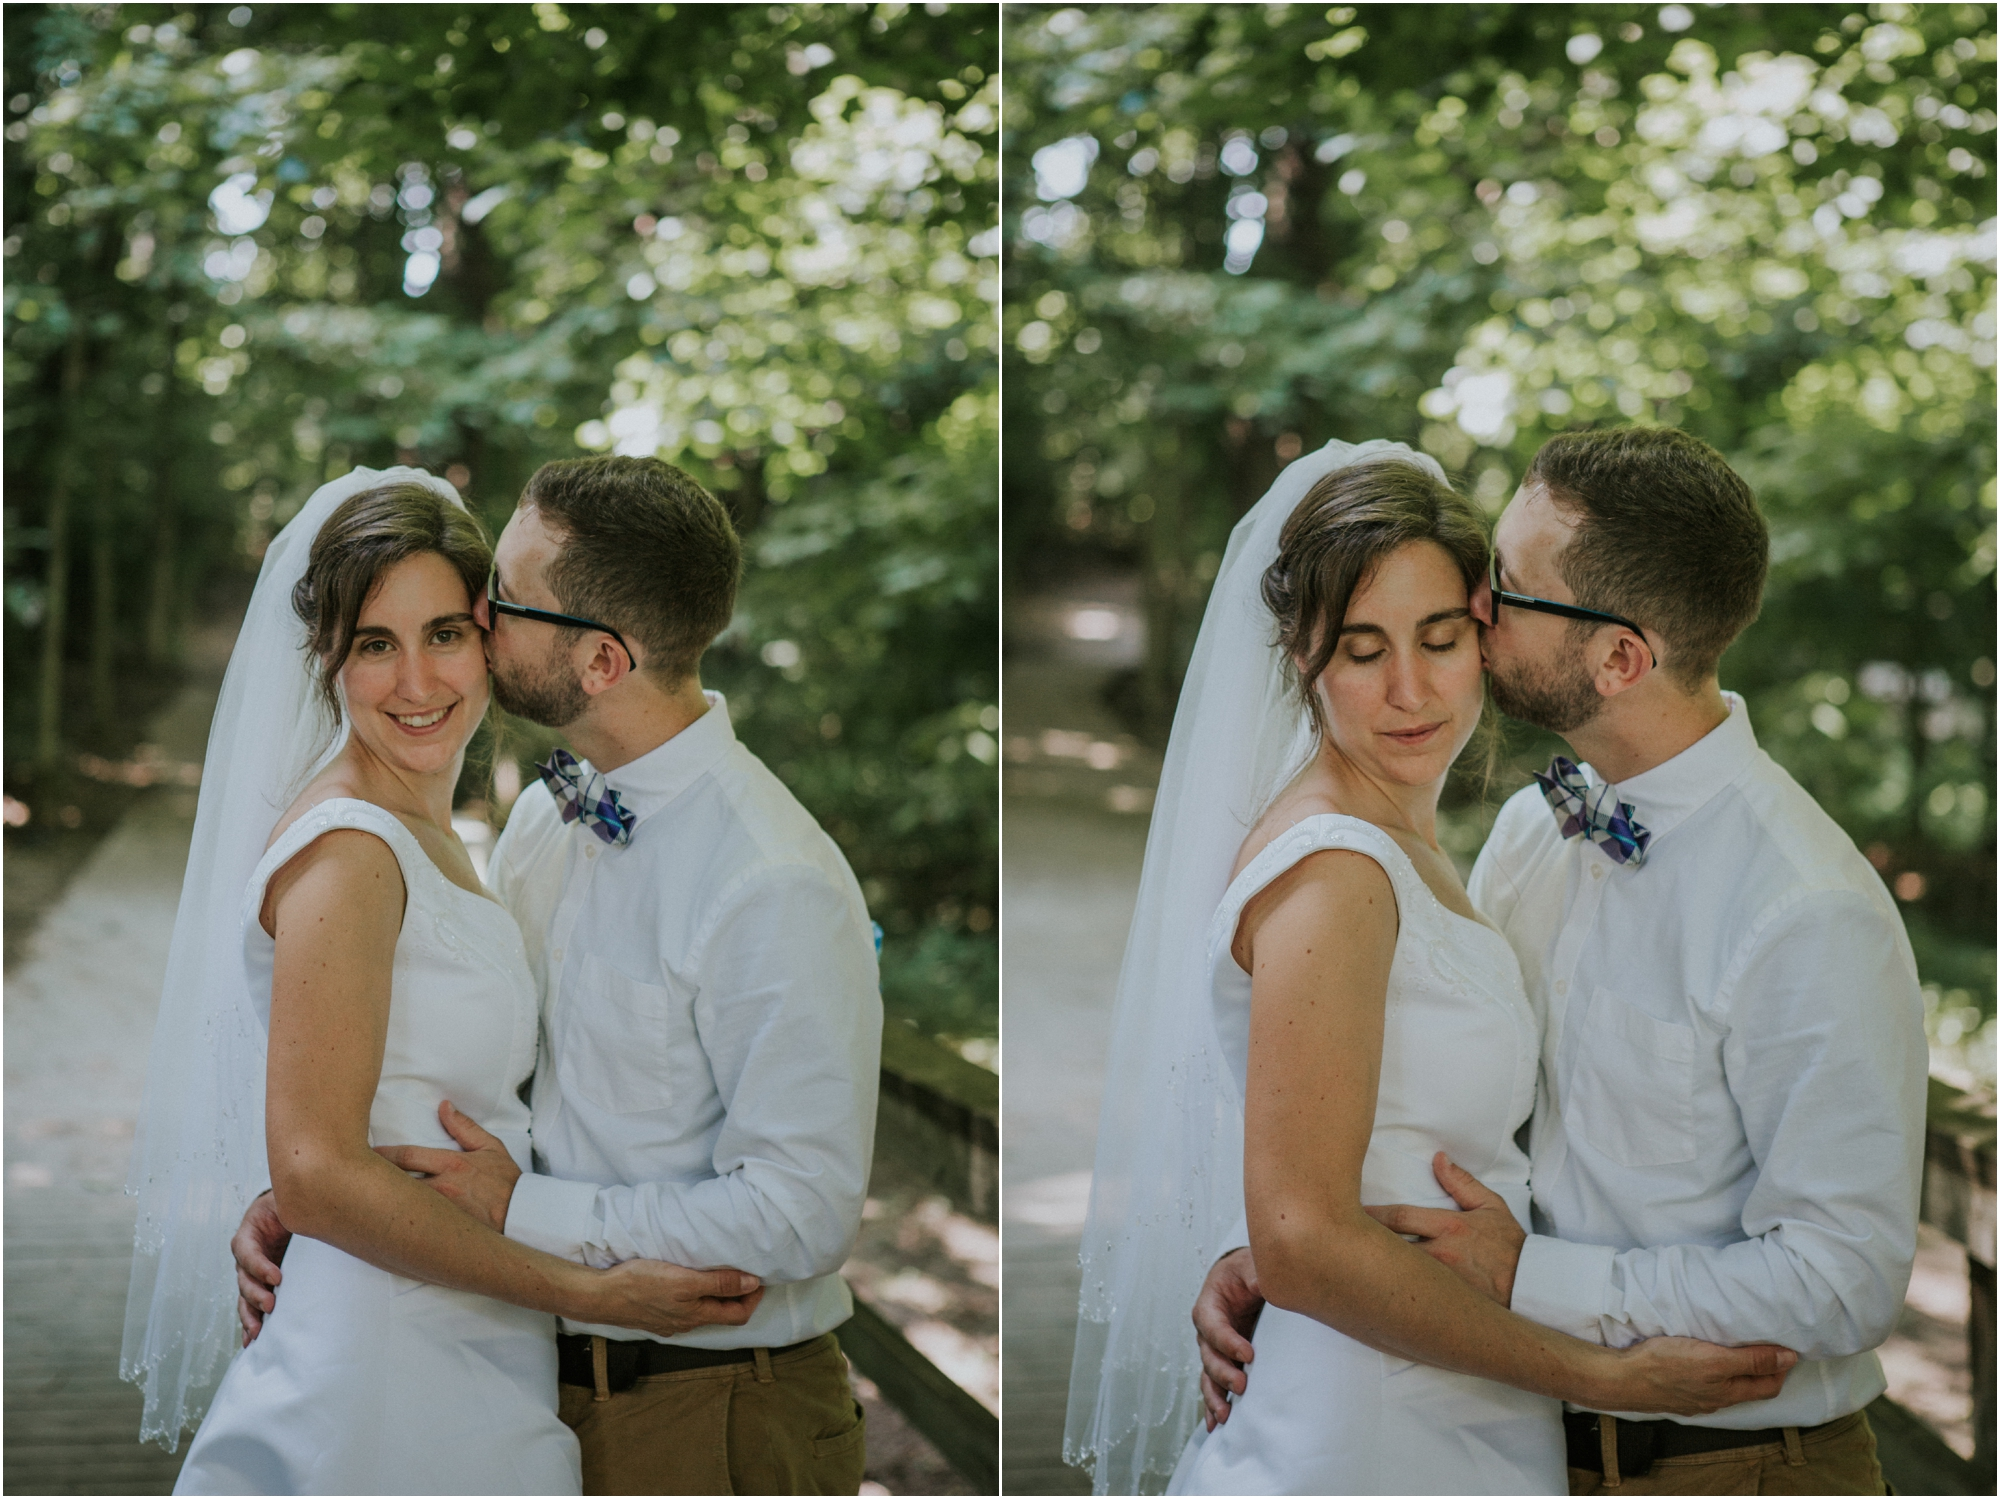 sugar-hollow-park-bristol-virginia-wedding-intimate-woodsy-black-forest-ceremony-adventurous-couple_0061.jpg